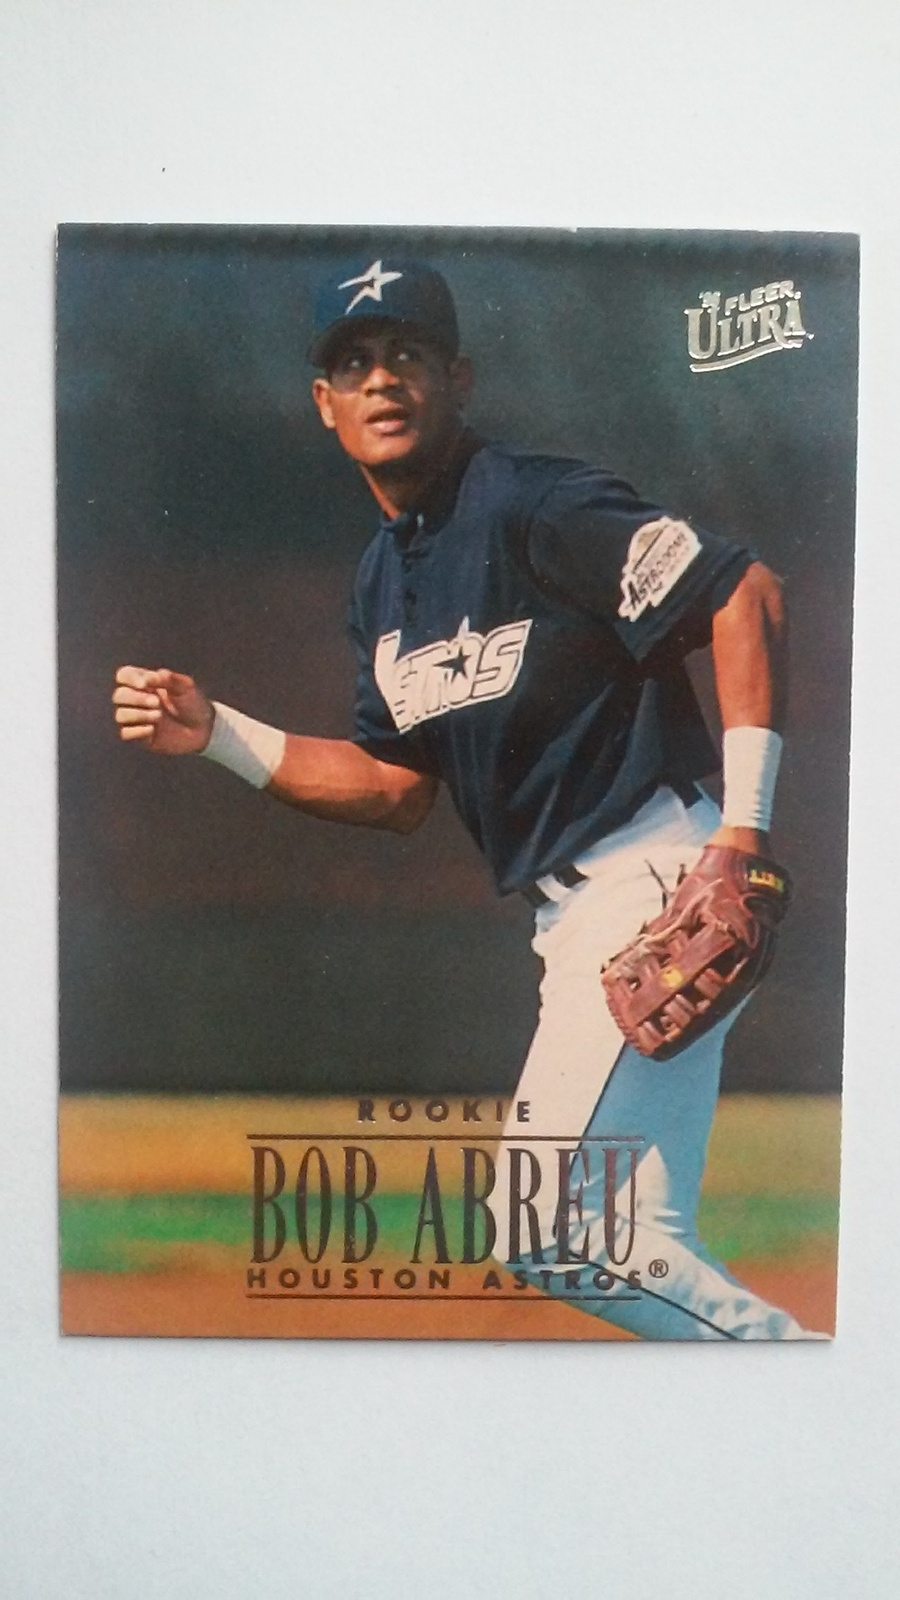 Bobby Abreu 1996 Fleer Ultra Rookie Card #483 Houston Astros Free Shipping